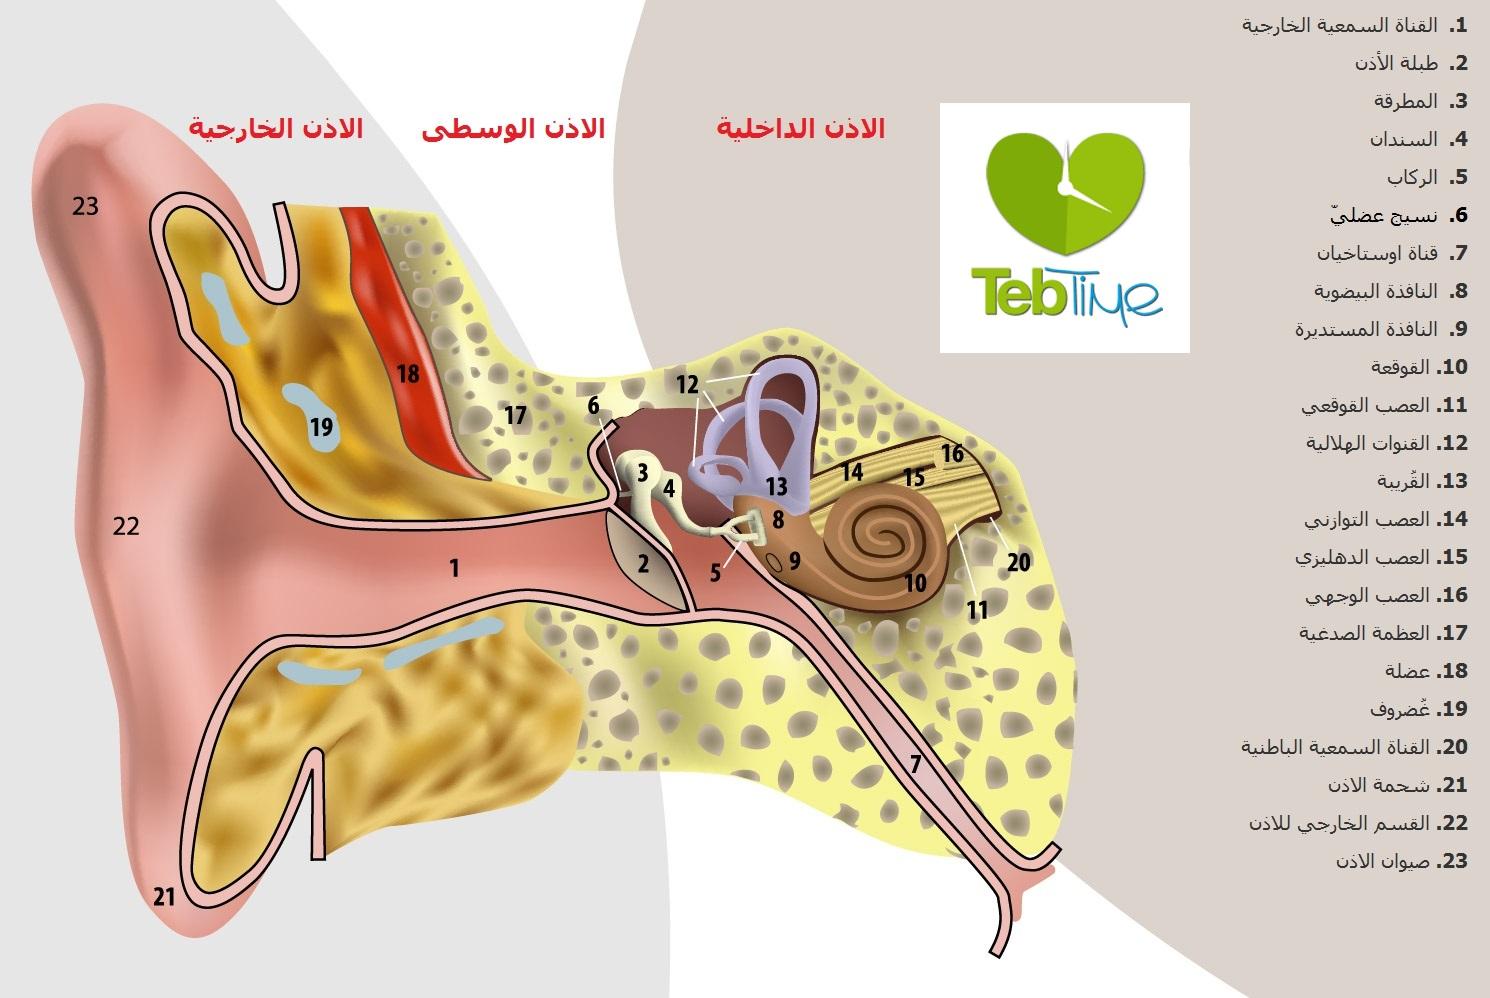 تشريح الأذن %D8%A7%D9%82%D8%B3%D8%A7%D9%85%20%D8%A7%D9%84%D8%A7%D8%B0%D9%86%20-%20TEBTIME1